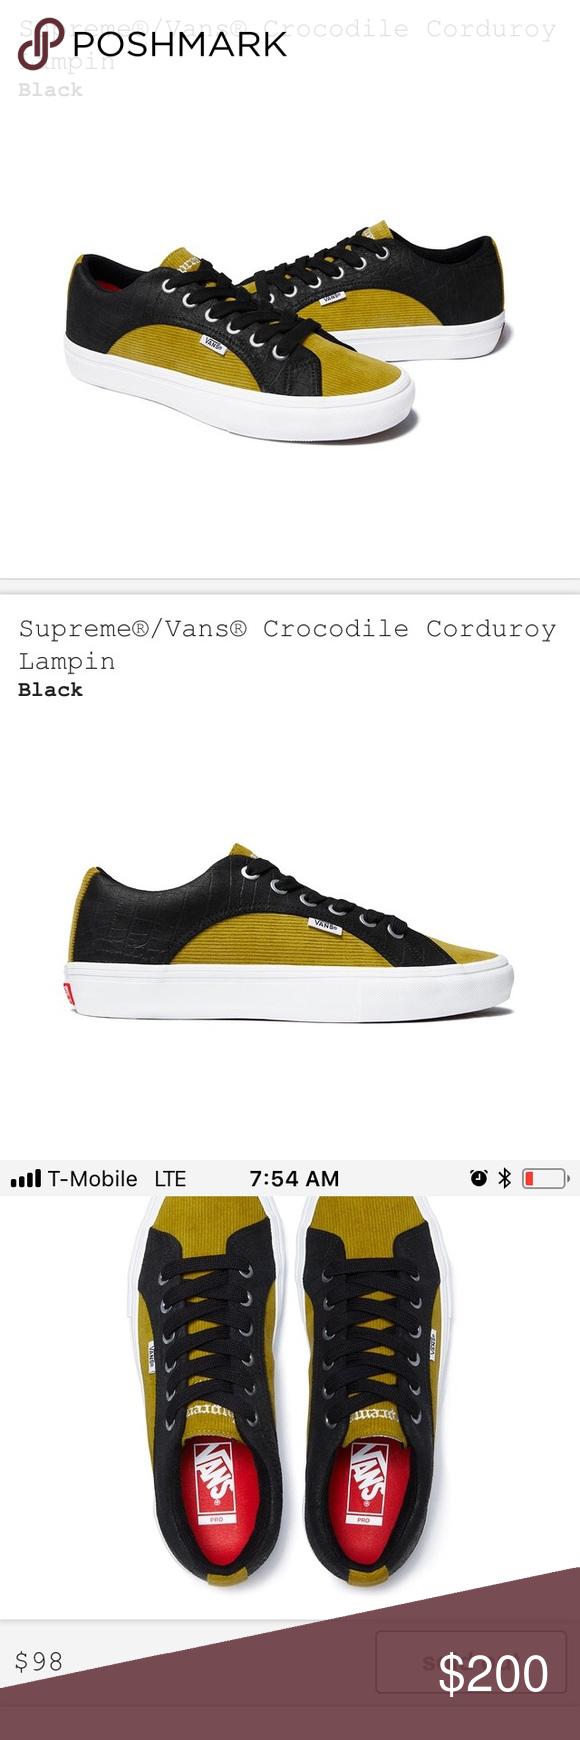 8119dea9d8 Supreme X Vans Crocodile Corduroy Lampin Sneakers Coming Soon!! New With  Box Deadstock.